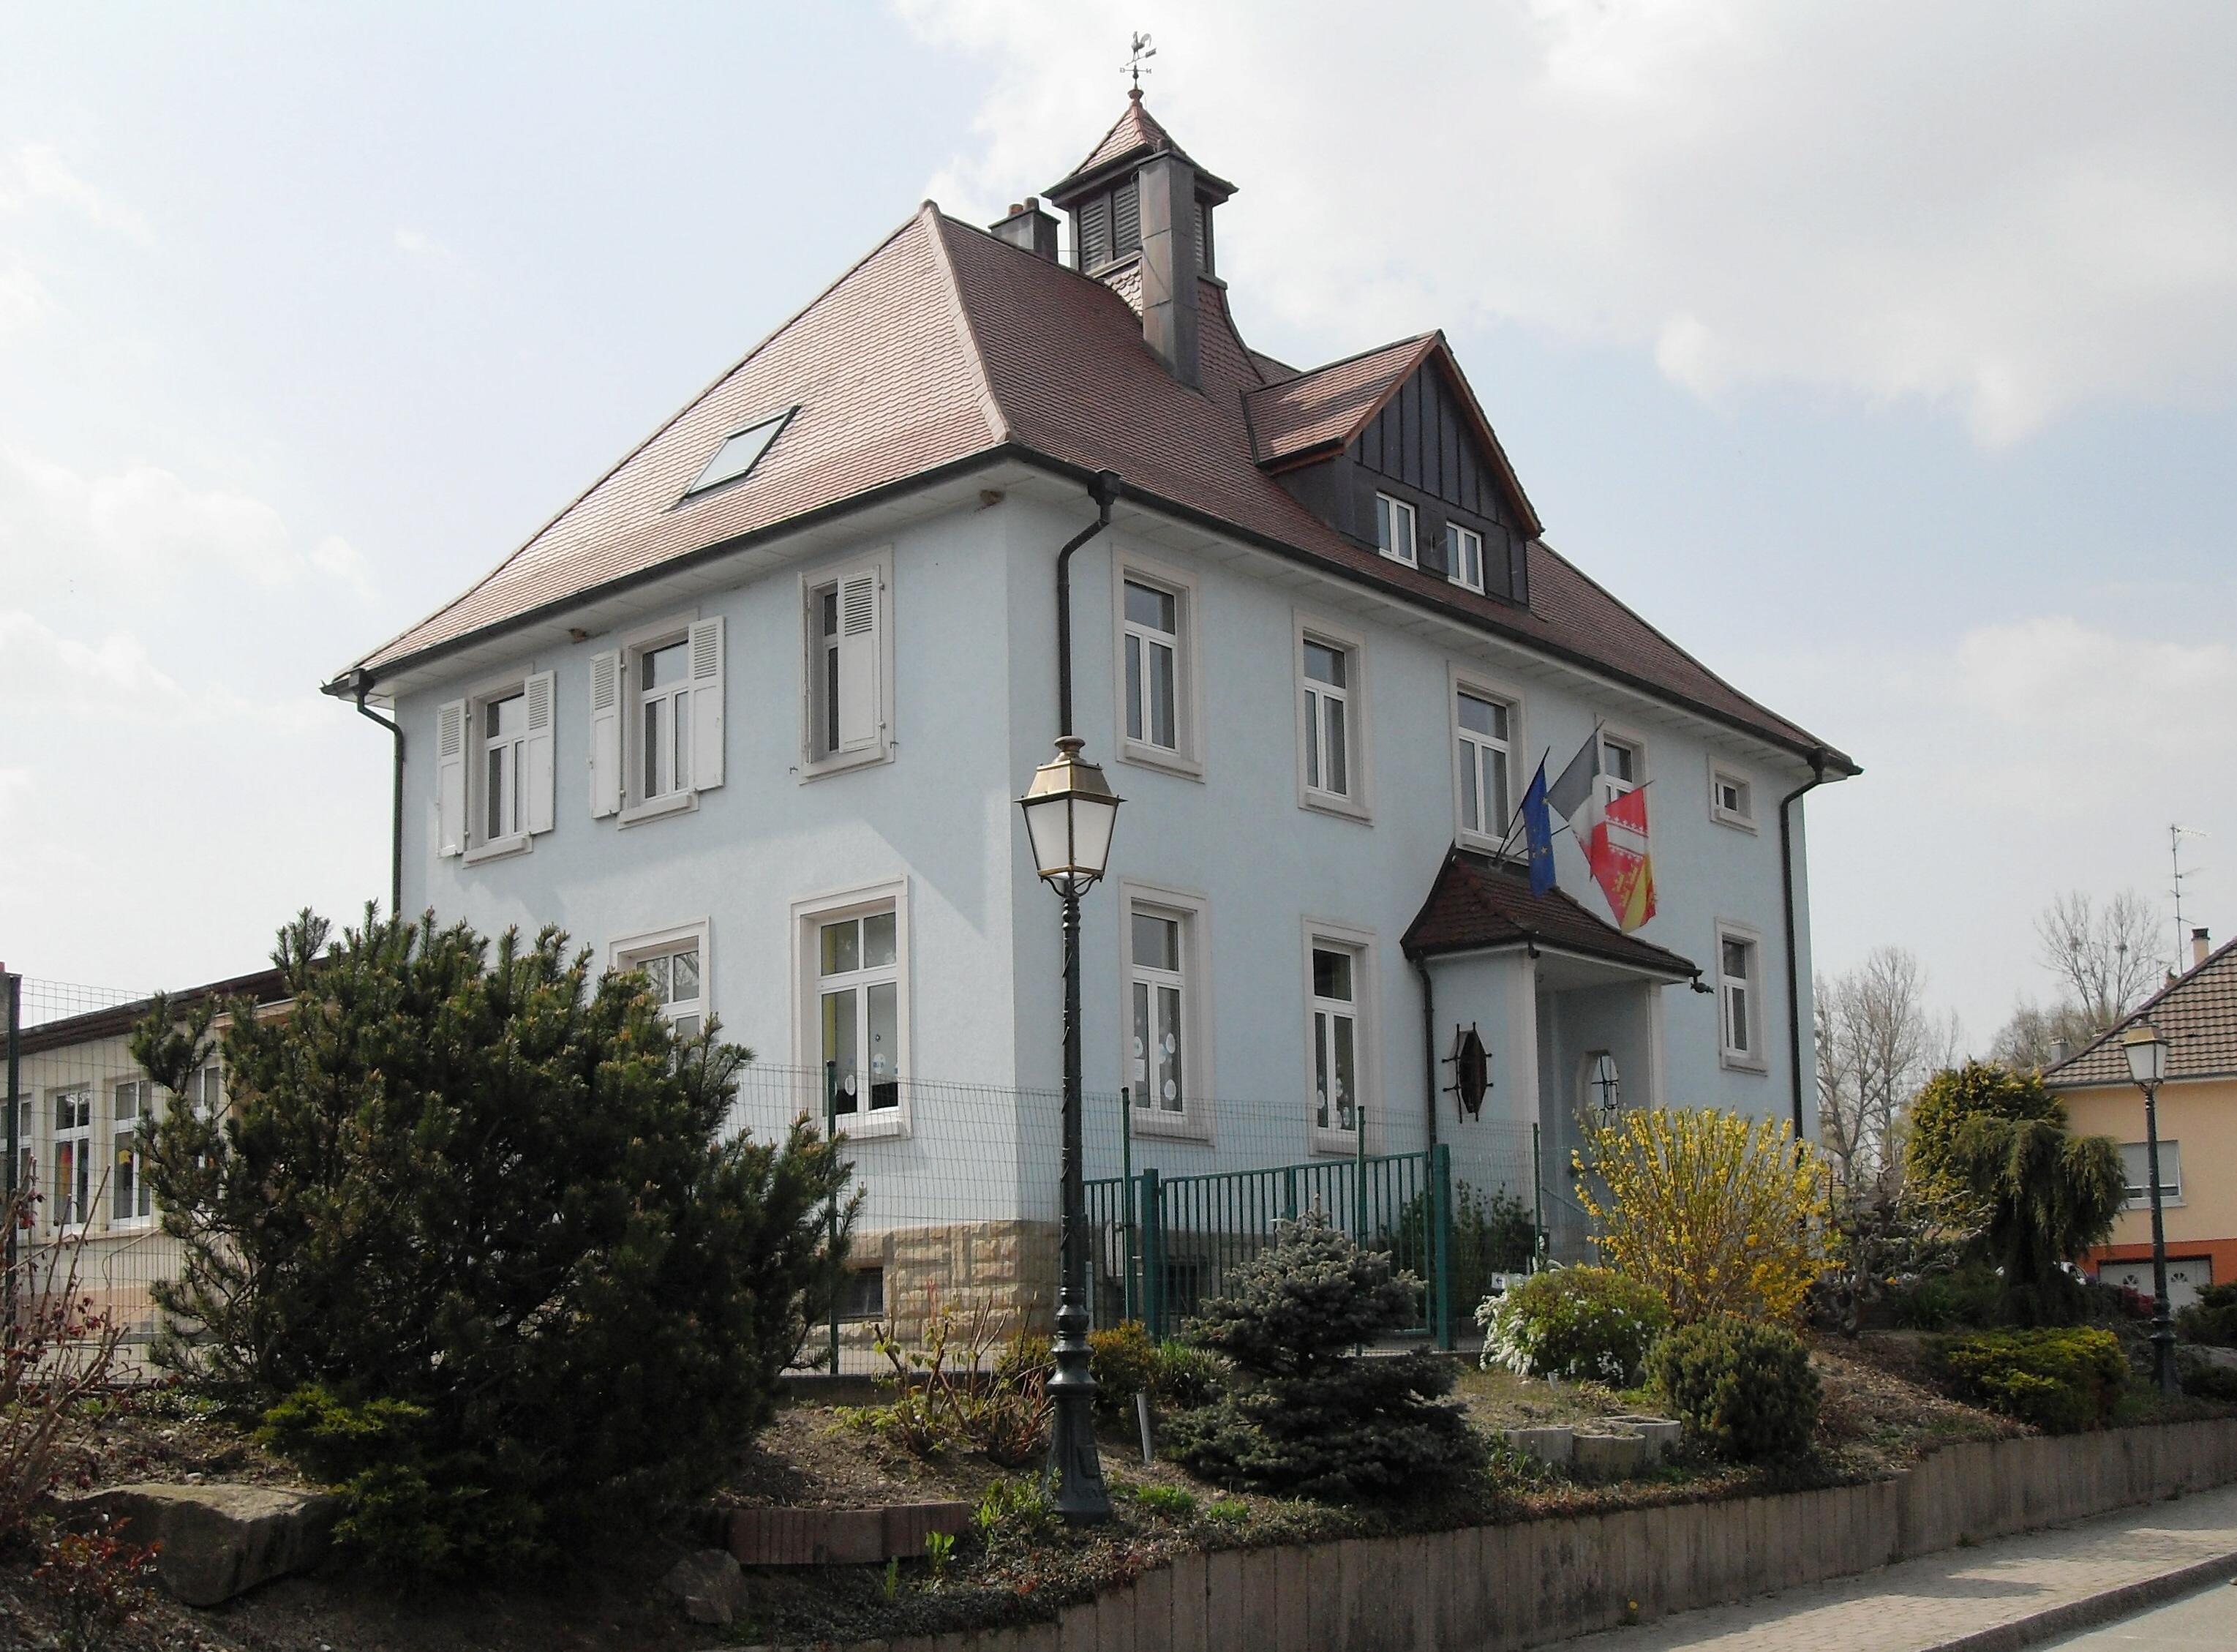 Kappelen, Haut-Rhin